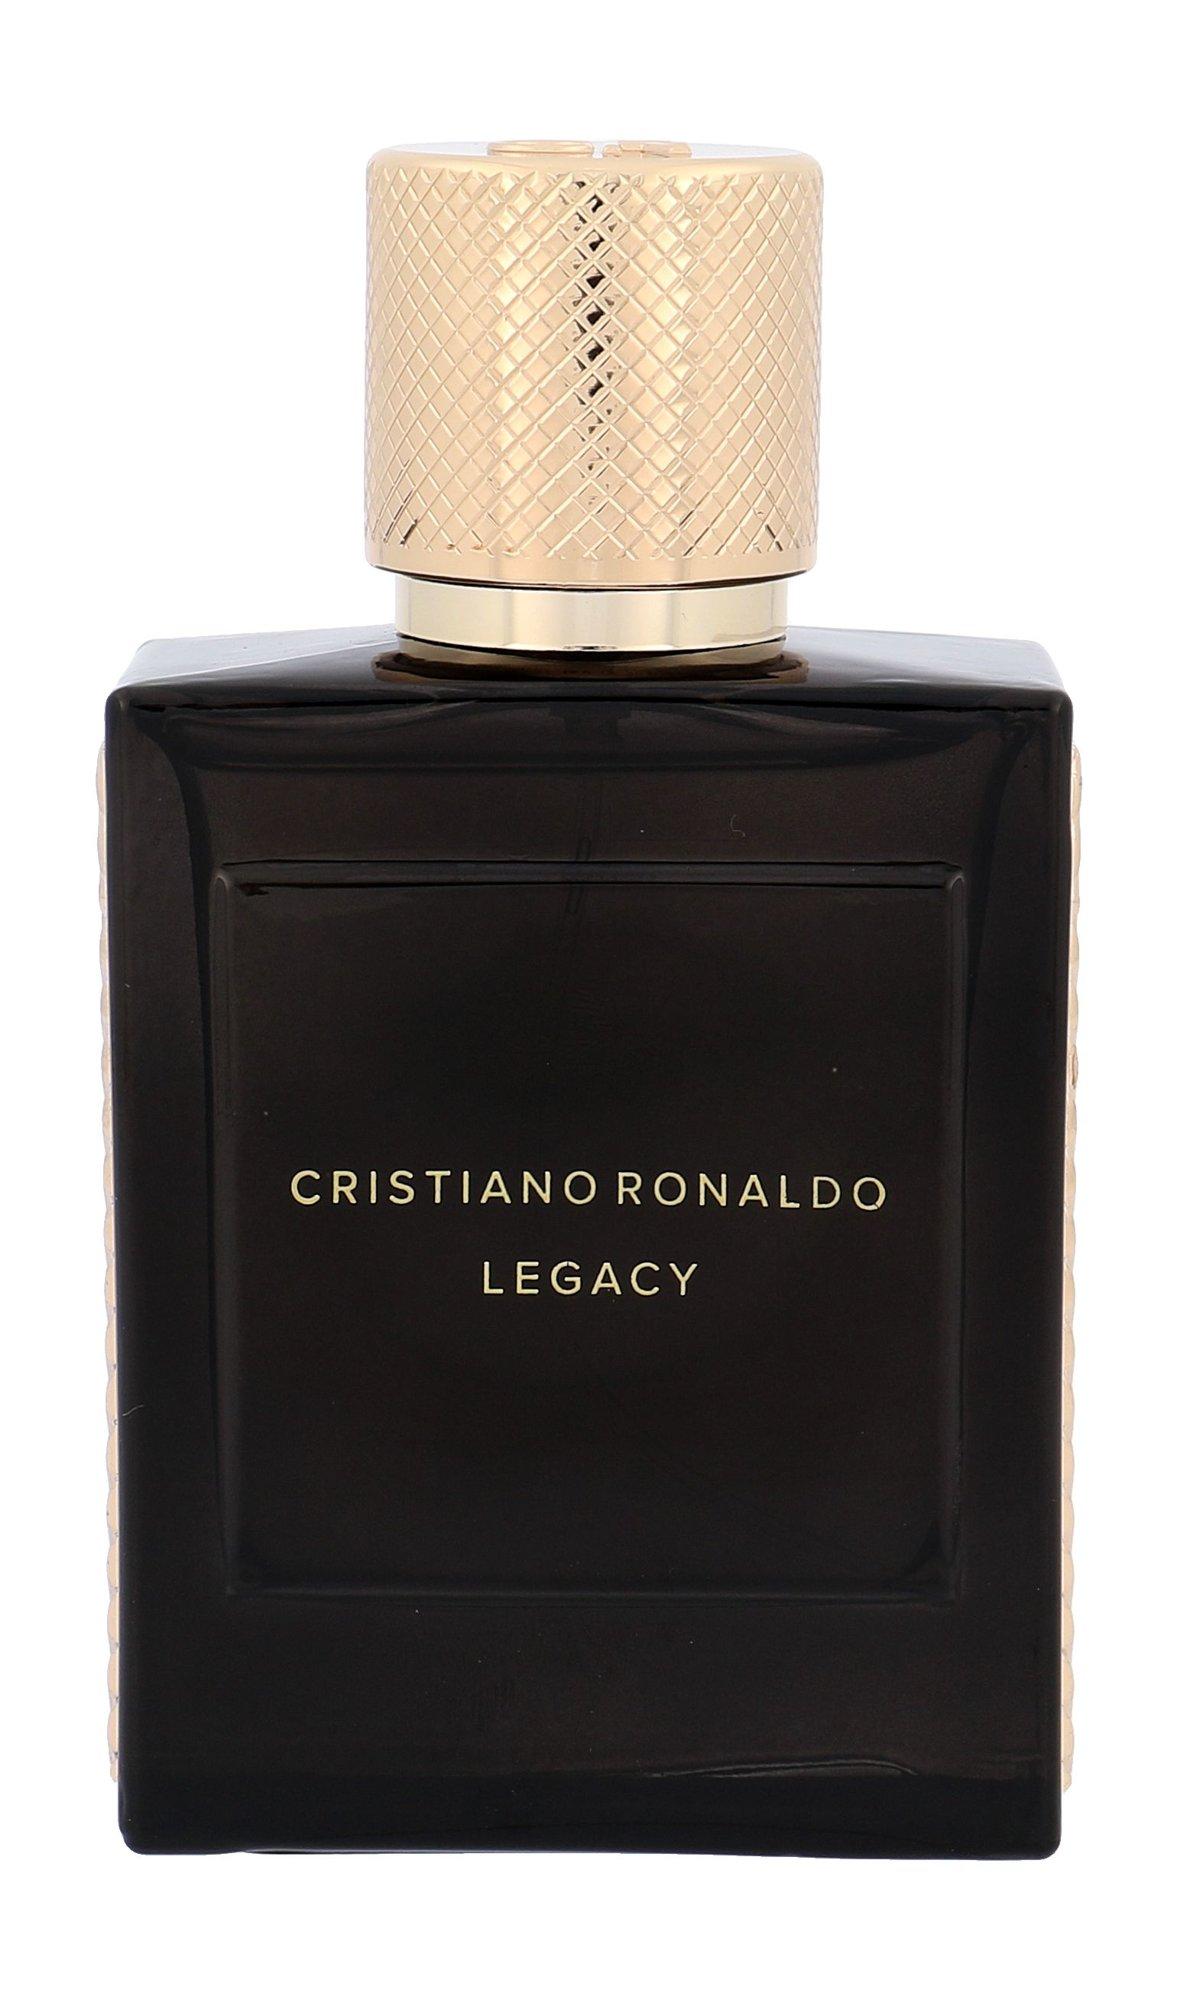 Cristiano Ronaldo Legacy EDT 50ml